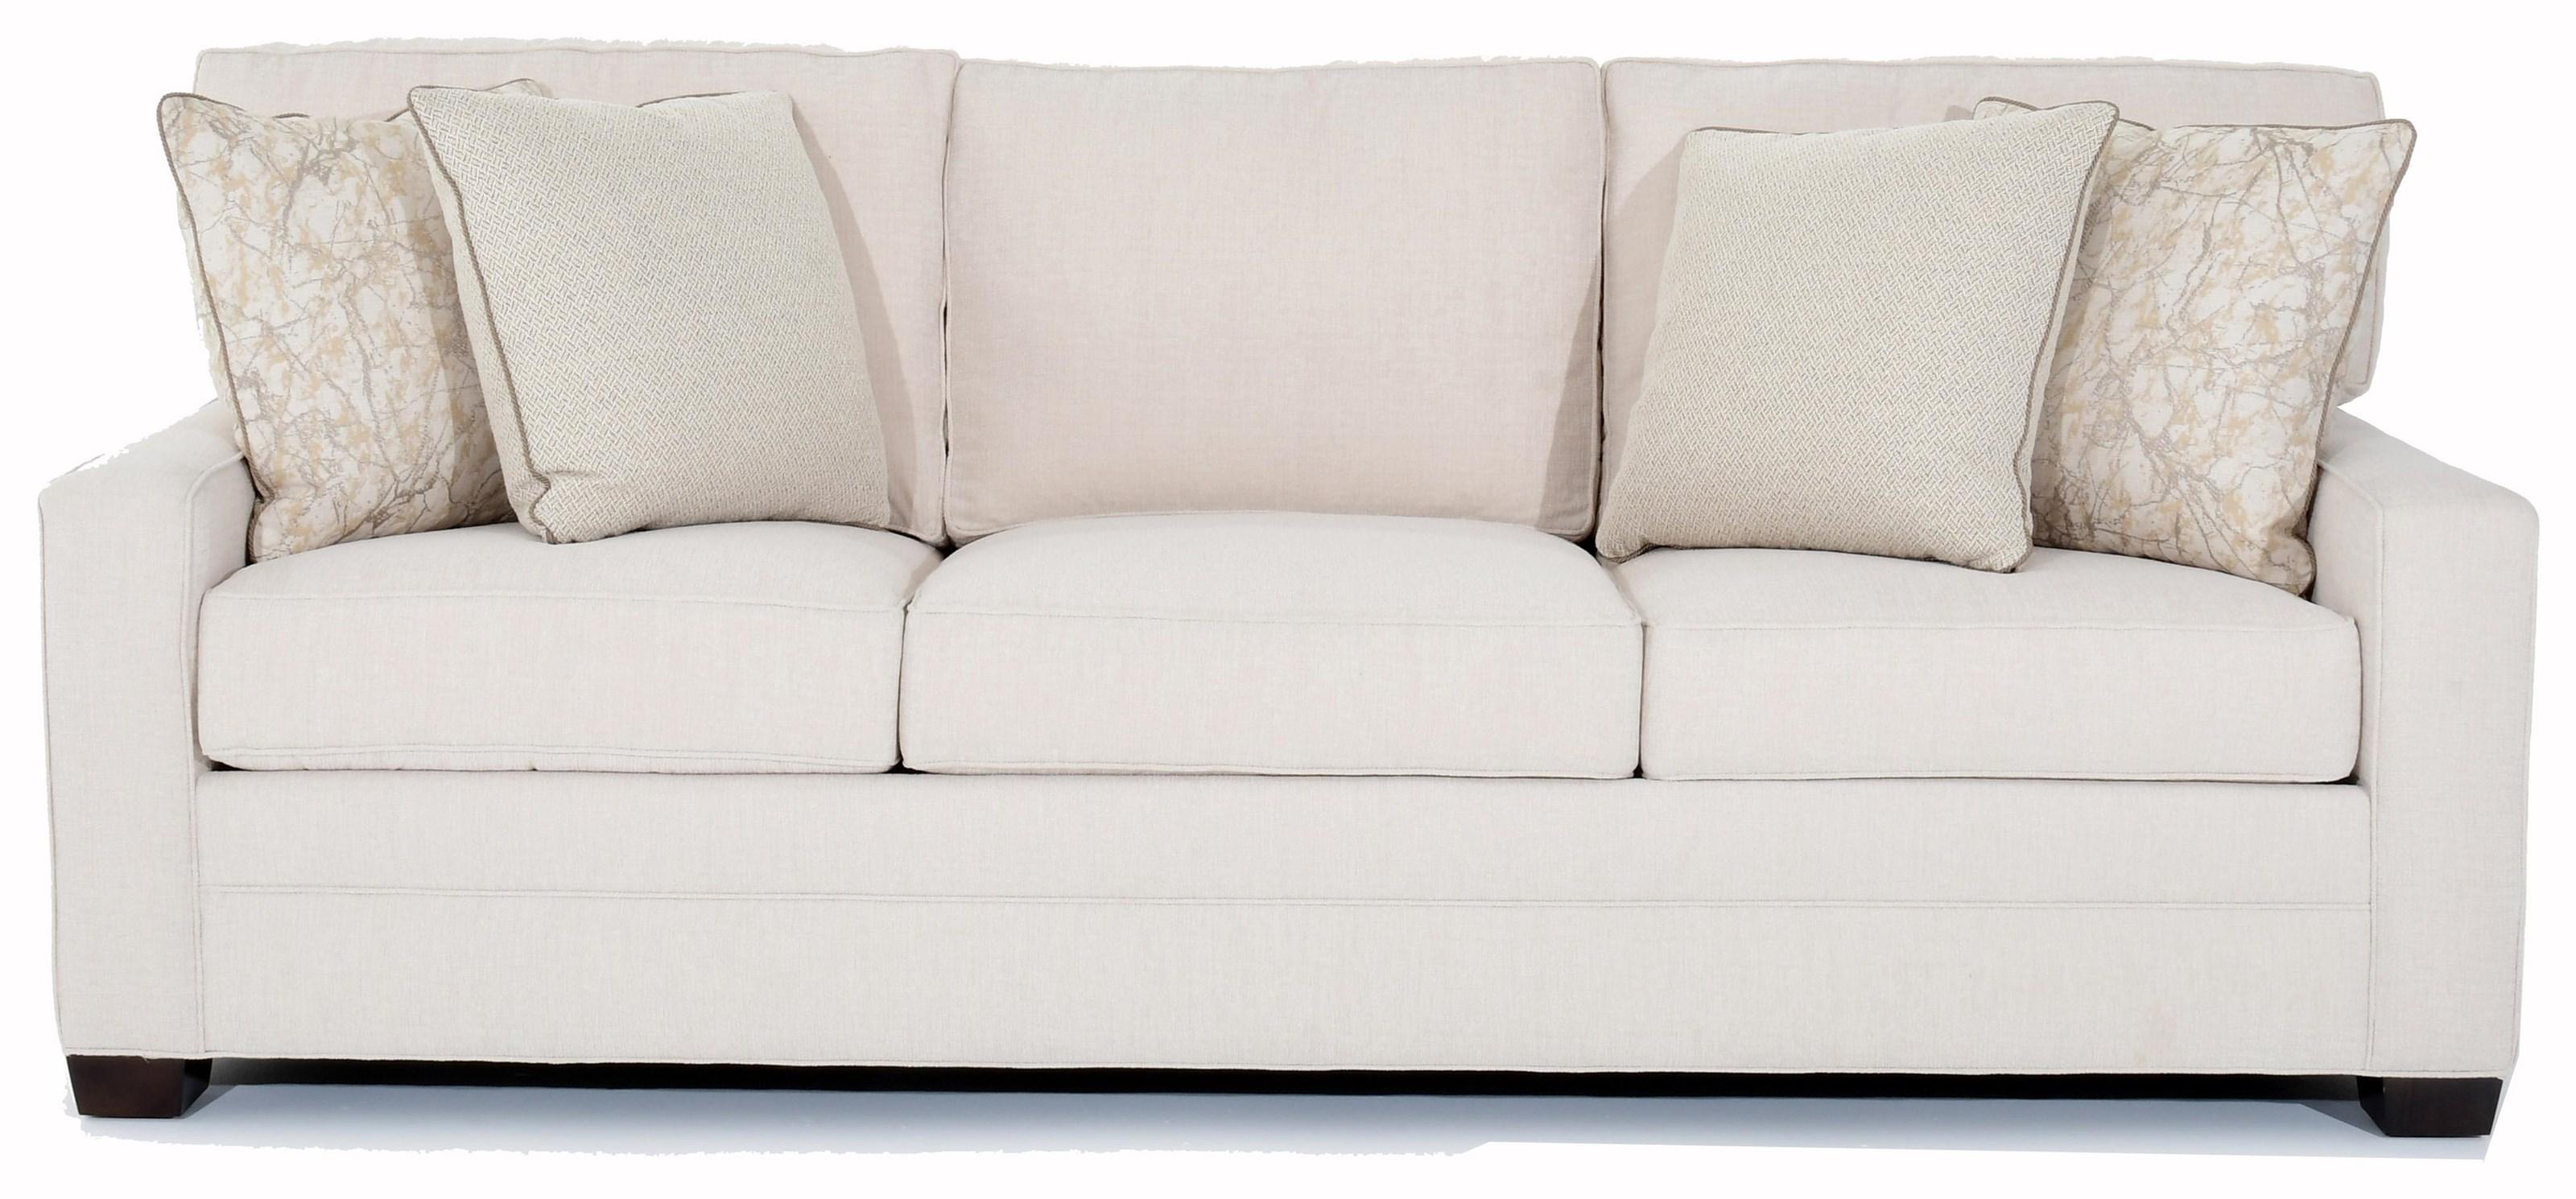 "2062 92"" Sofa by Huntington House at Baer's Furniture"